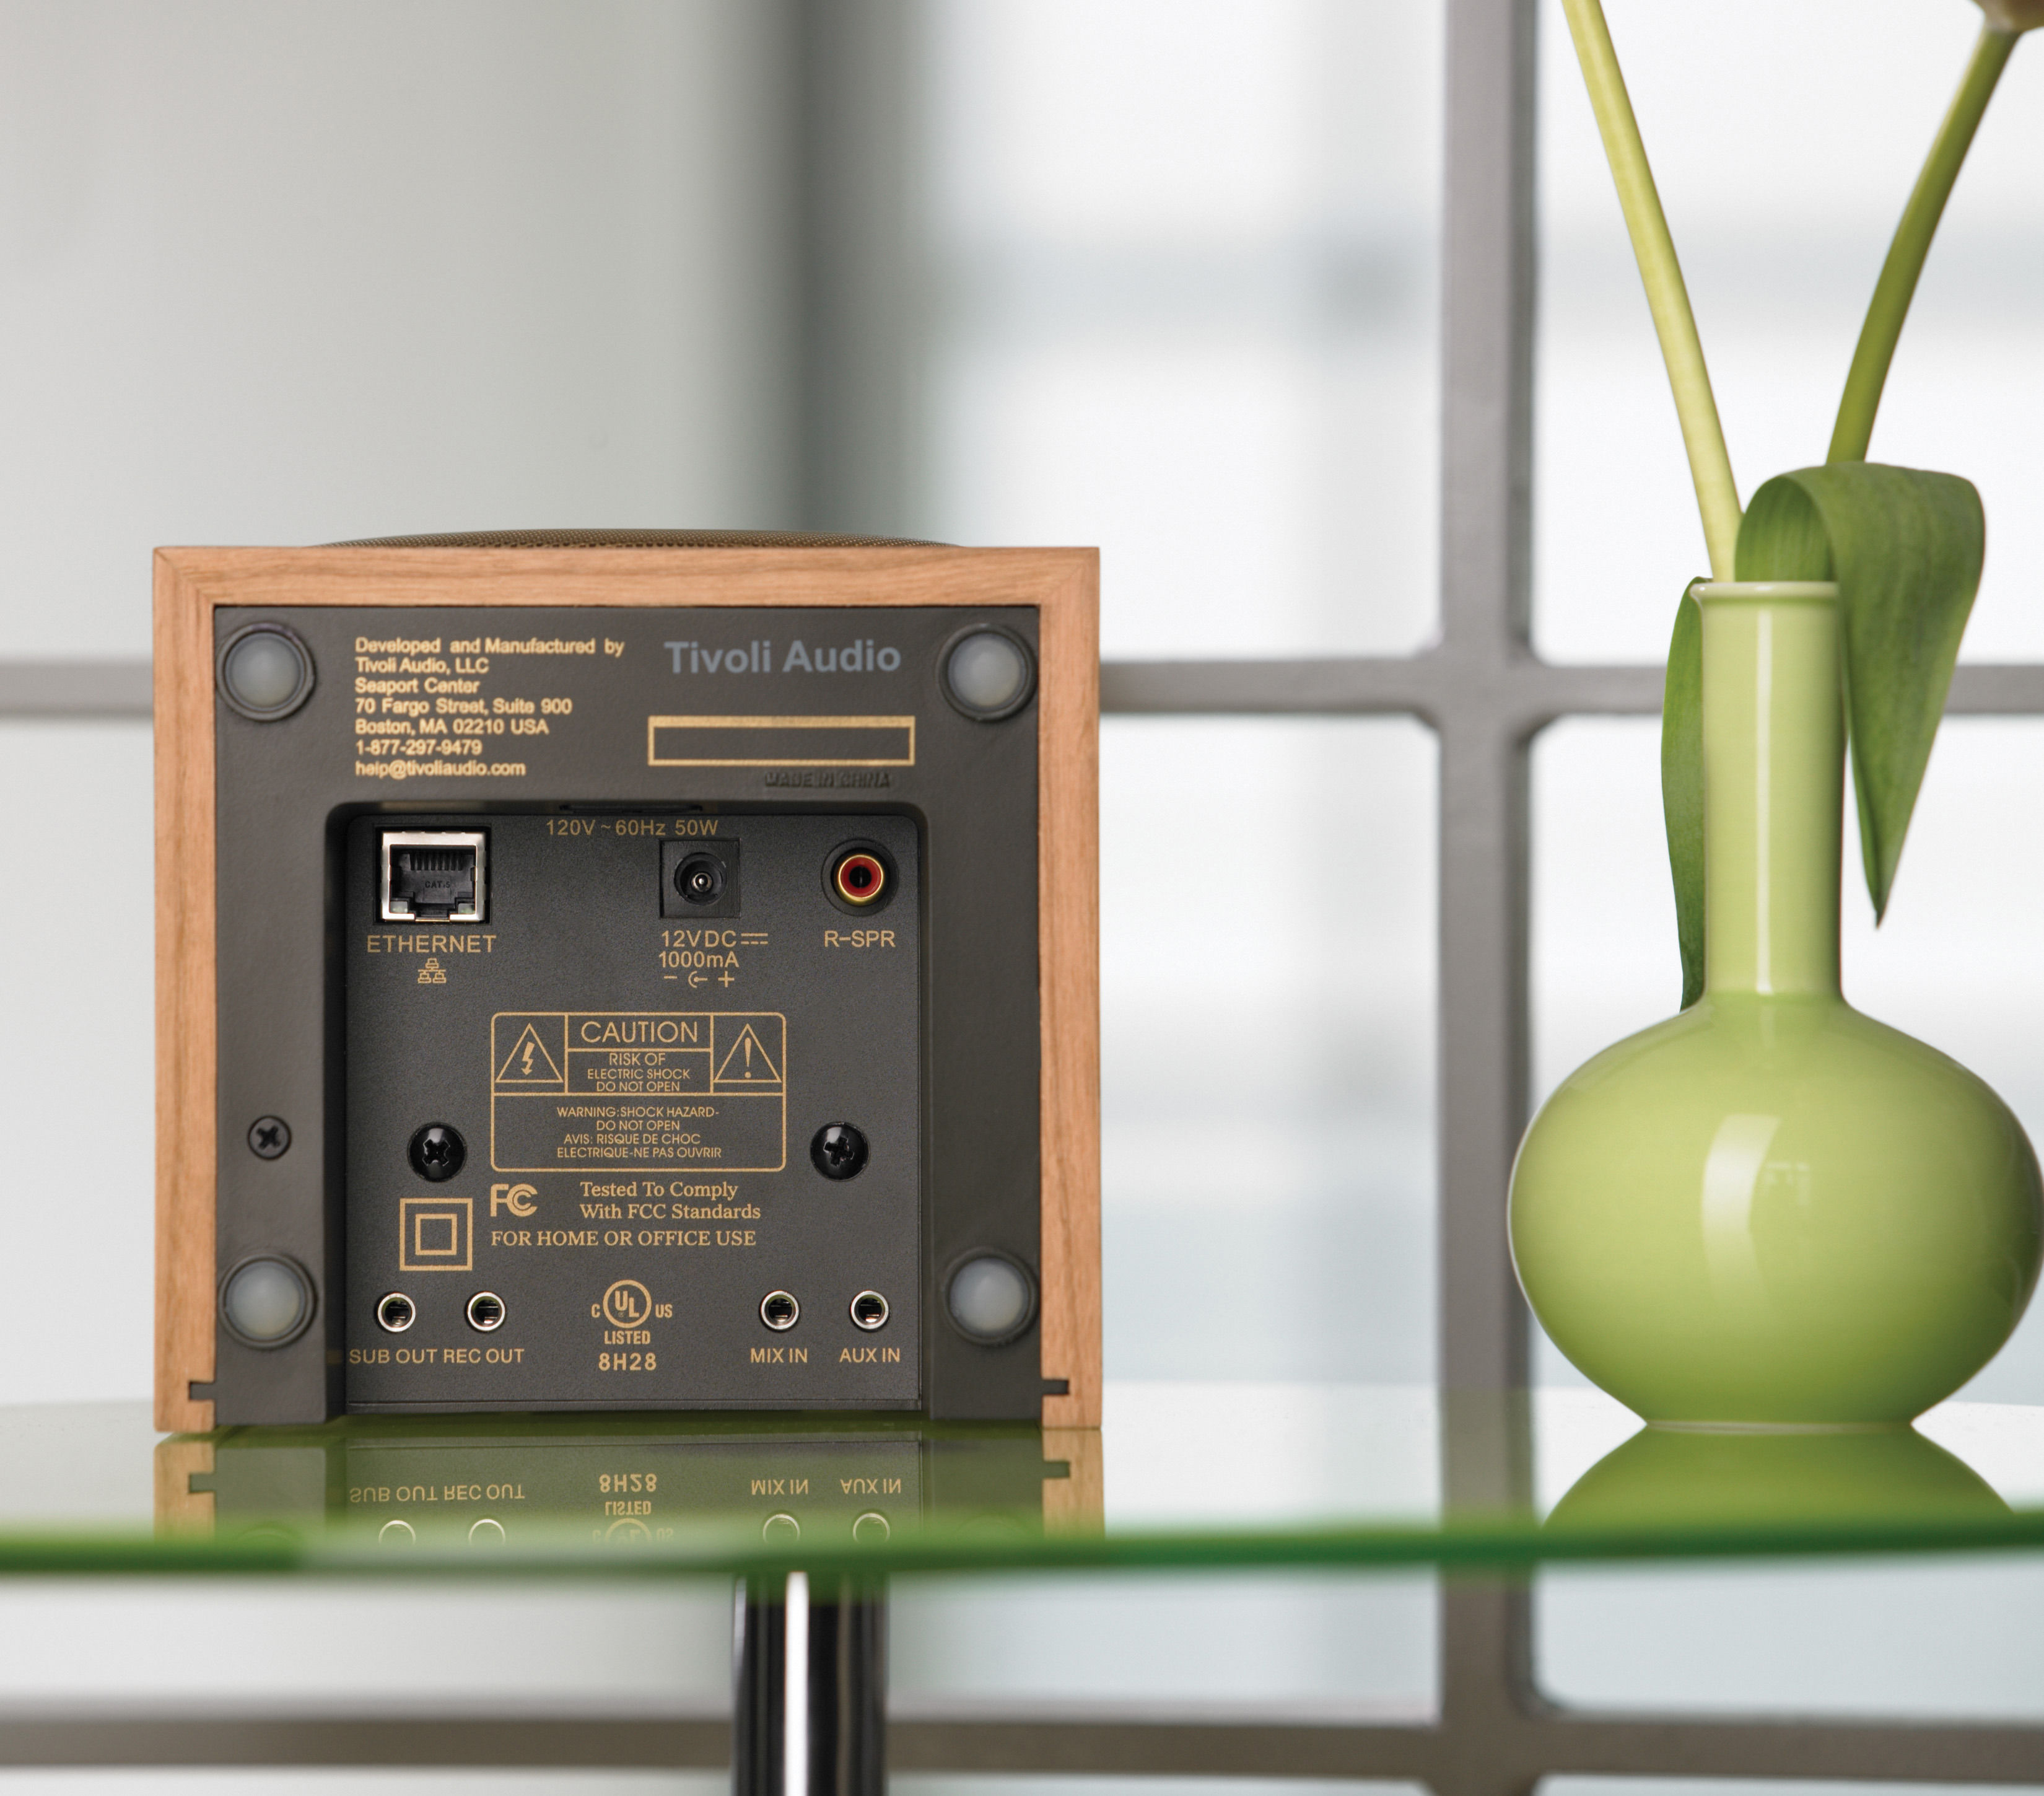 radio networks radio internet et enceinte compatible ipod. Black Bedroom Furniture Sets. Home Design Ideas